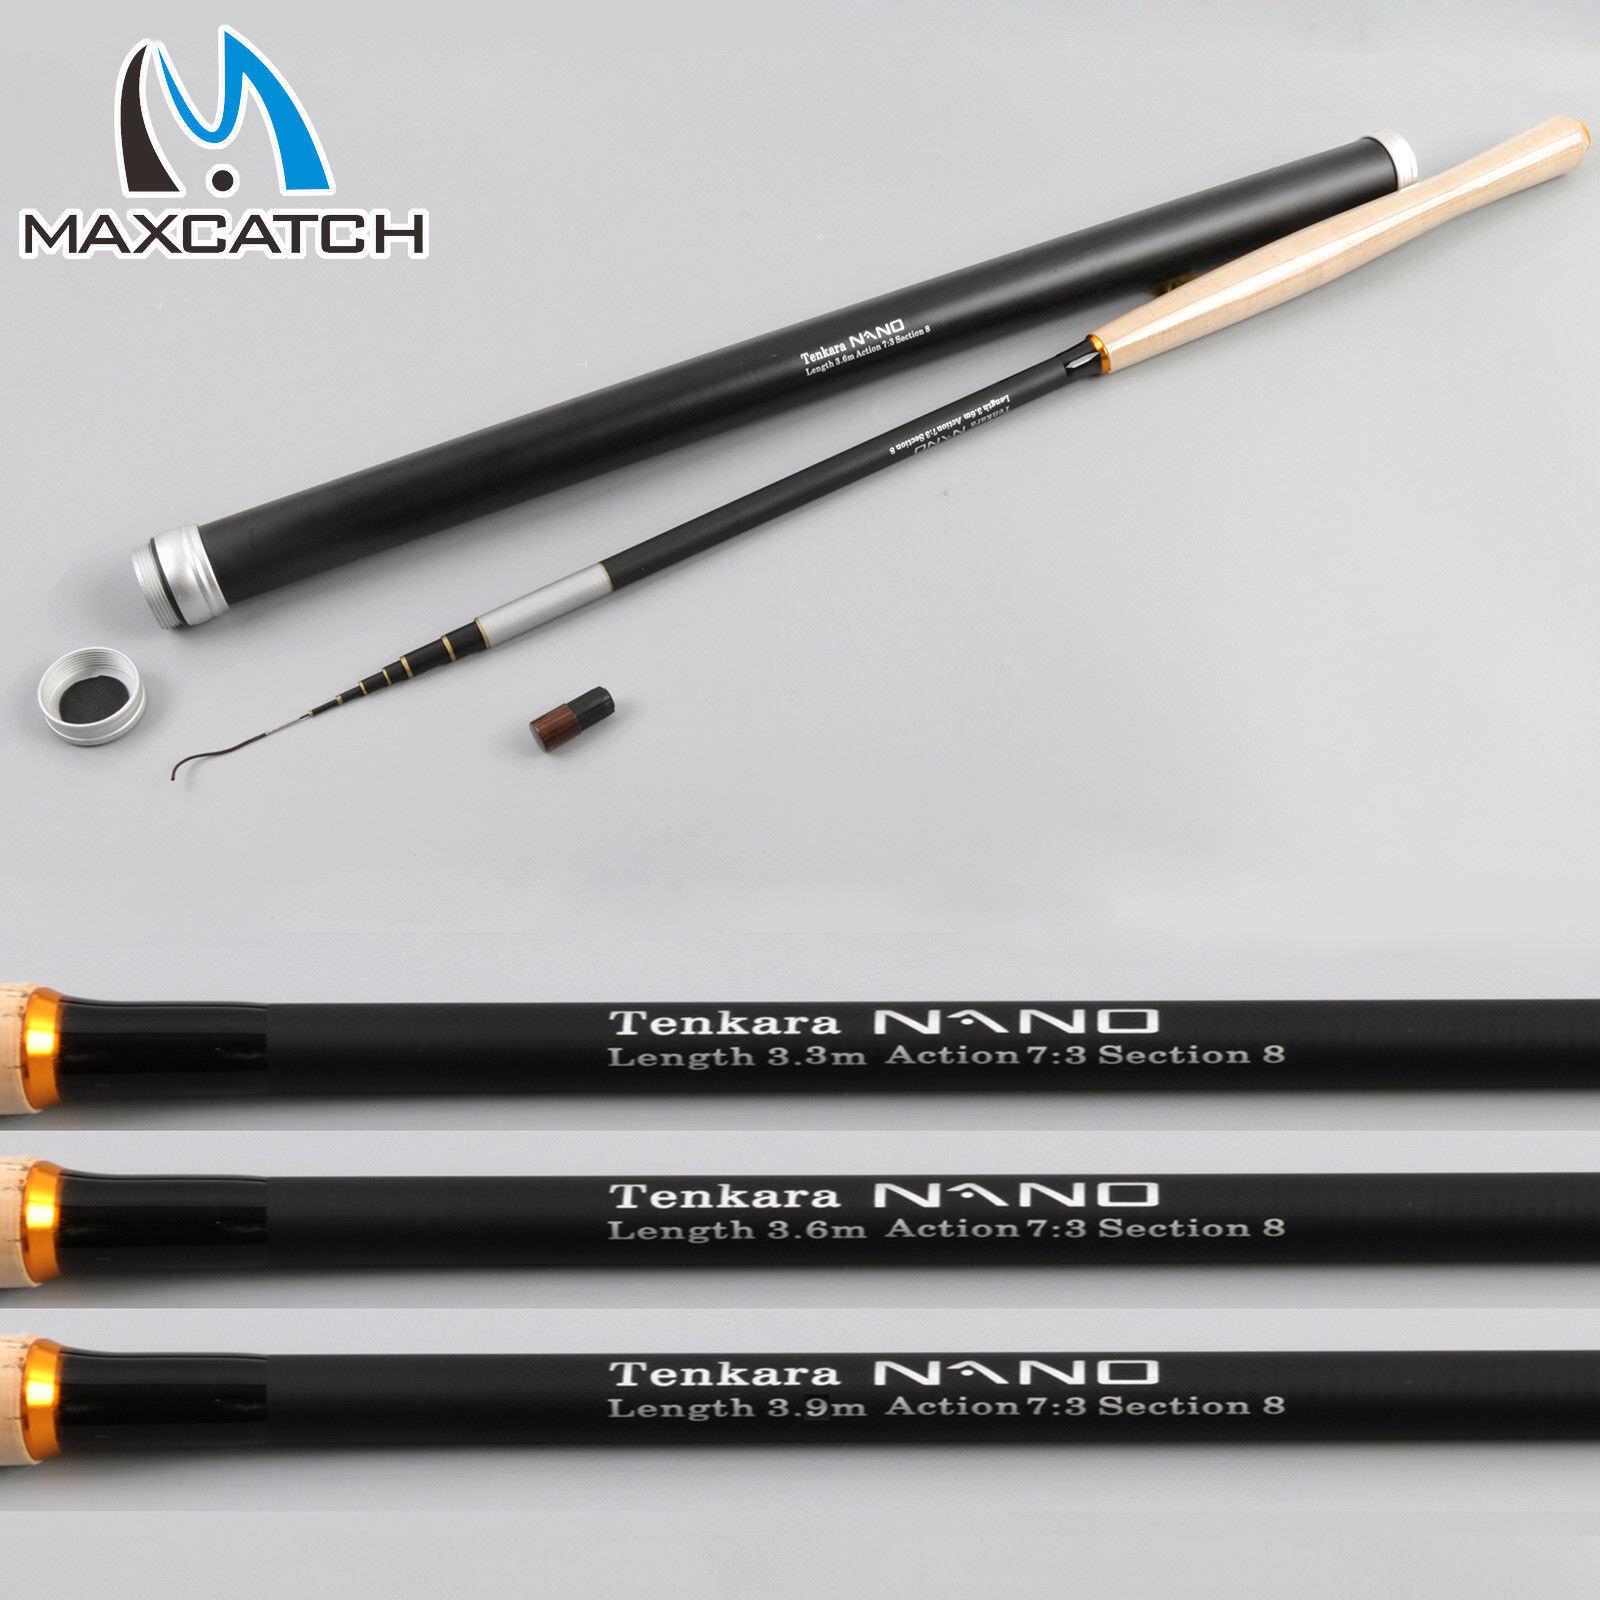 Maxcatch 11'12'13' Nano Tenkara Rods IM1240T autobon Tube Telescopic Pole